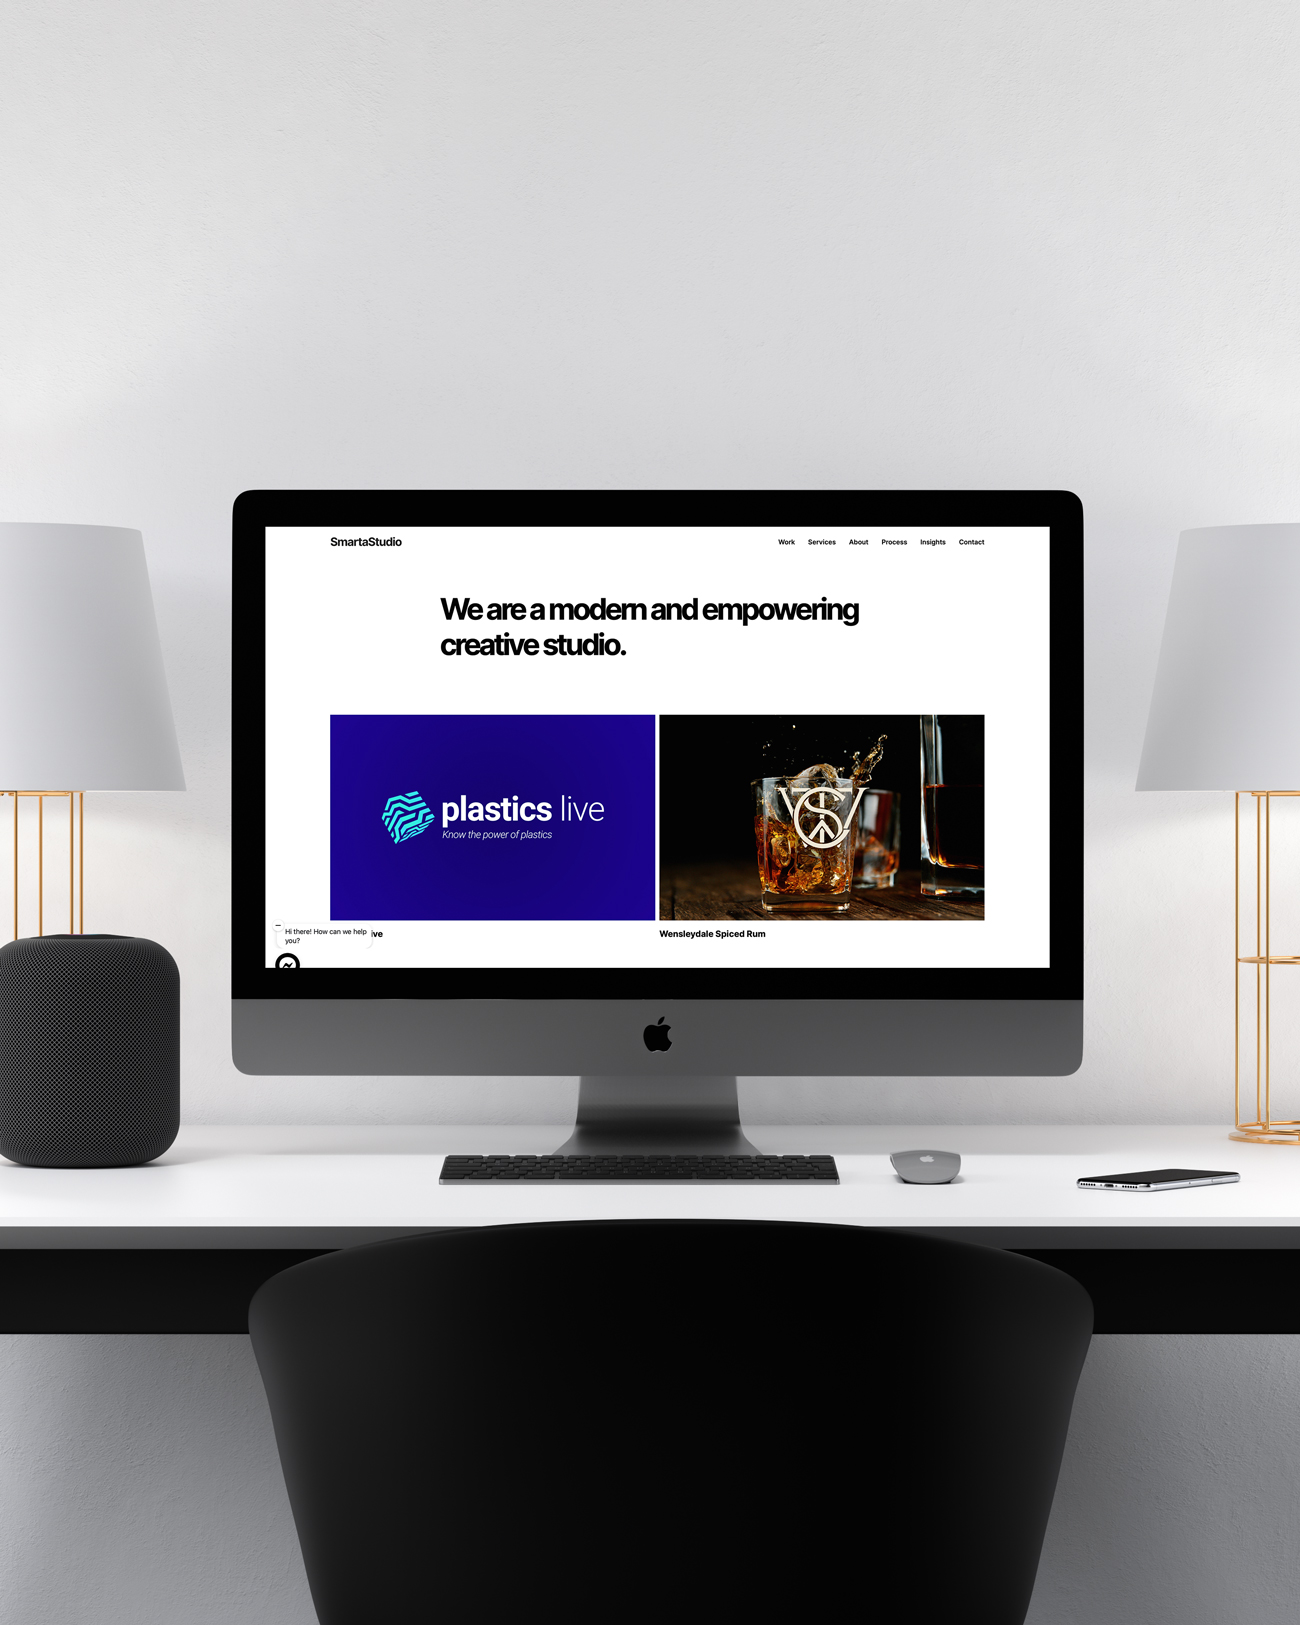 Web Design Cheshire - SmartaStudio